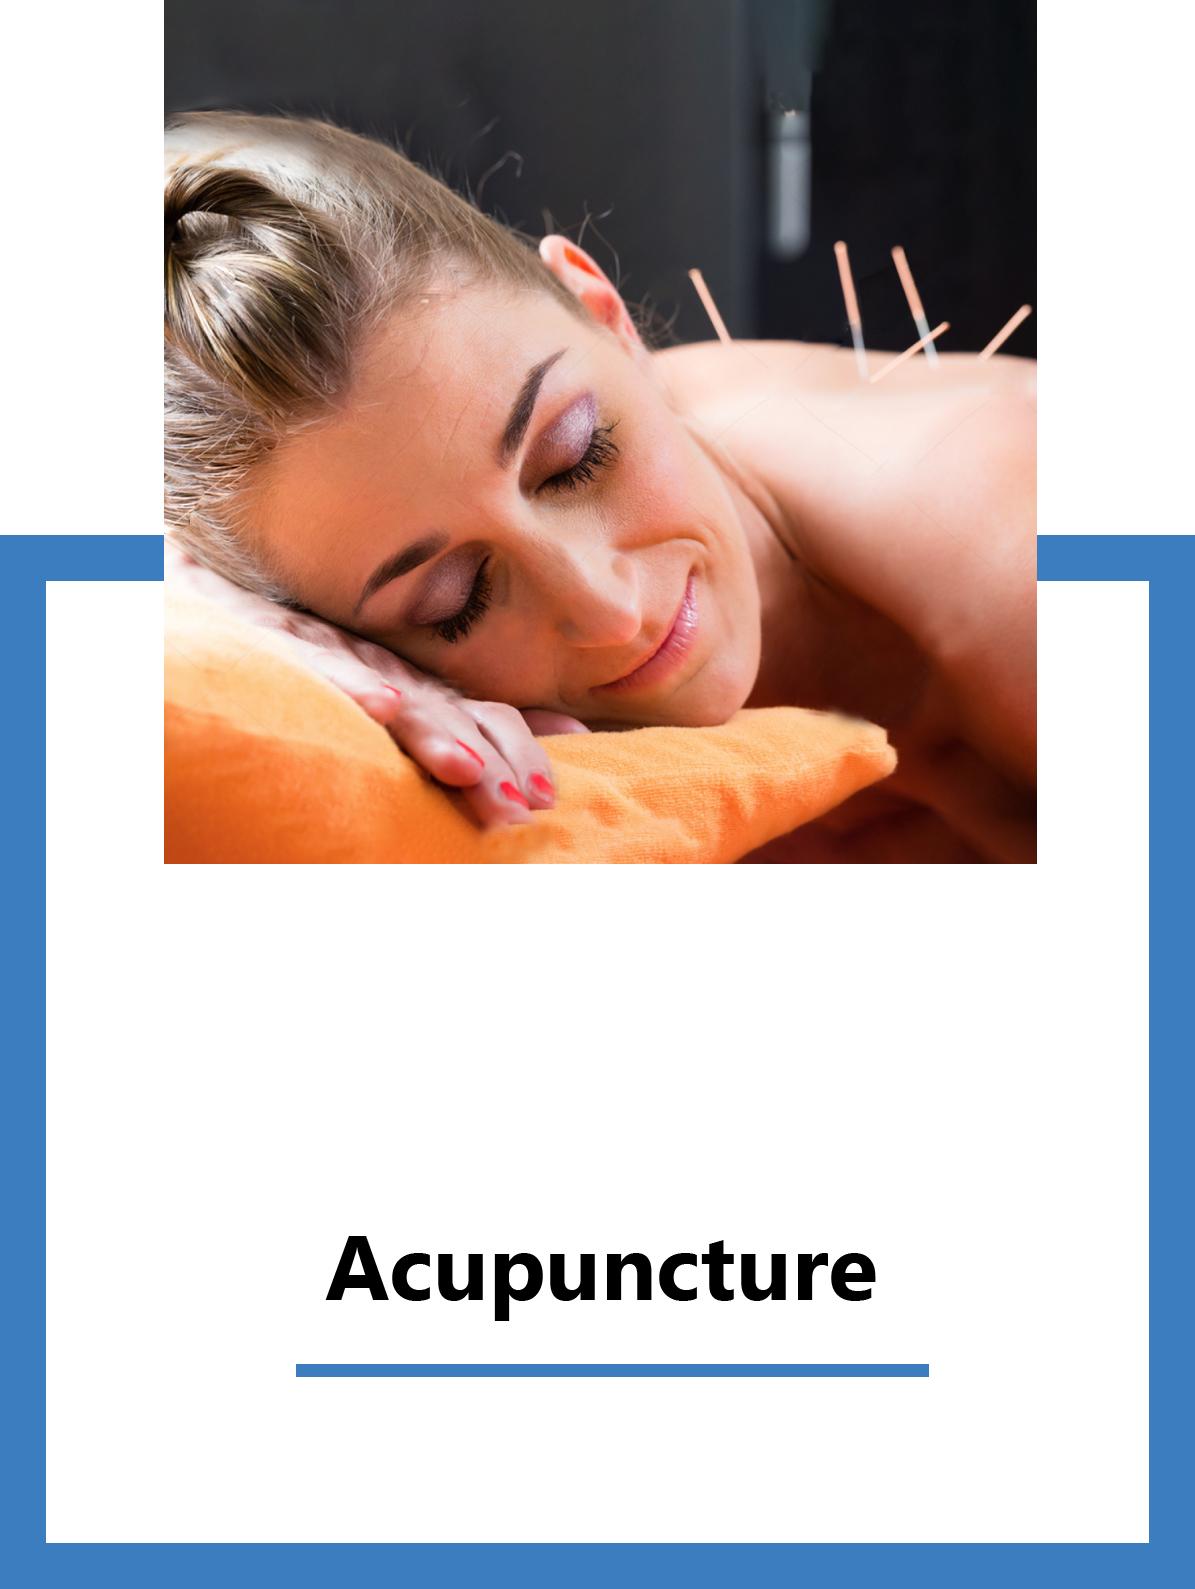 Acupuncture-Grapevine-Texas